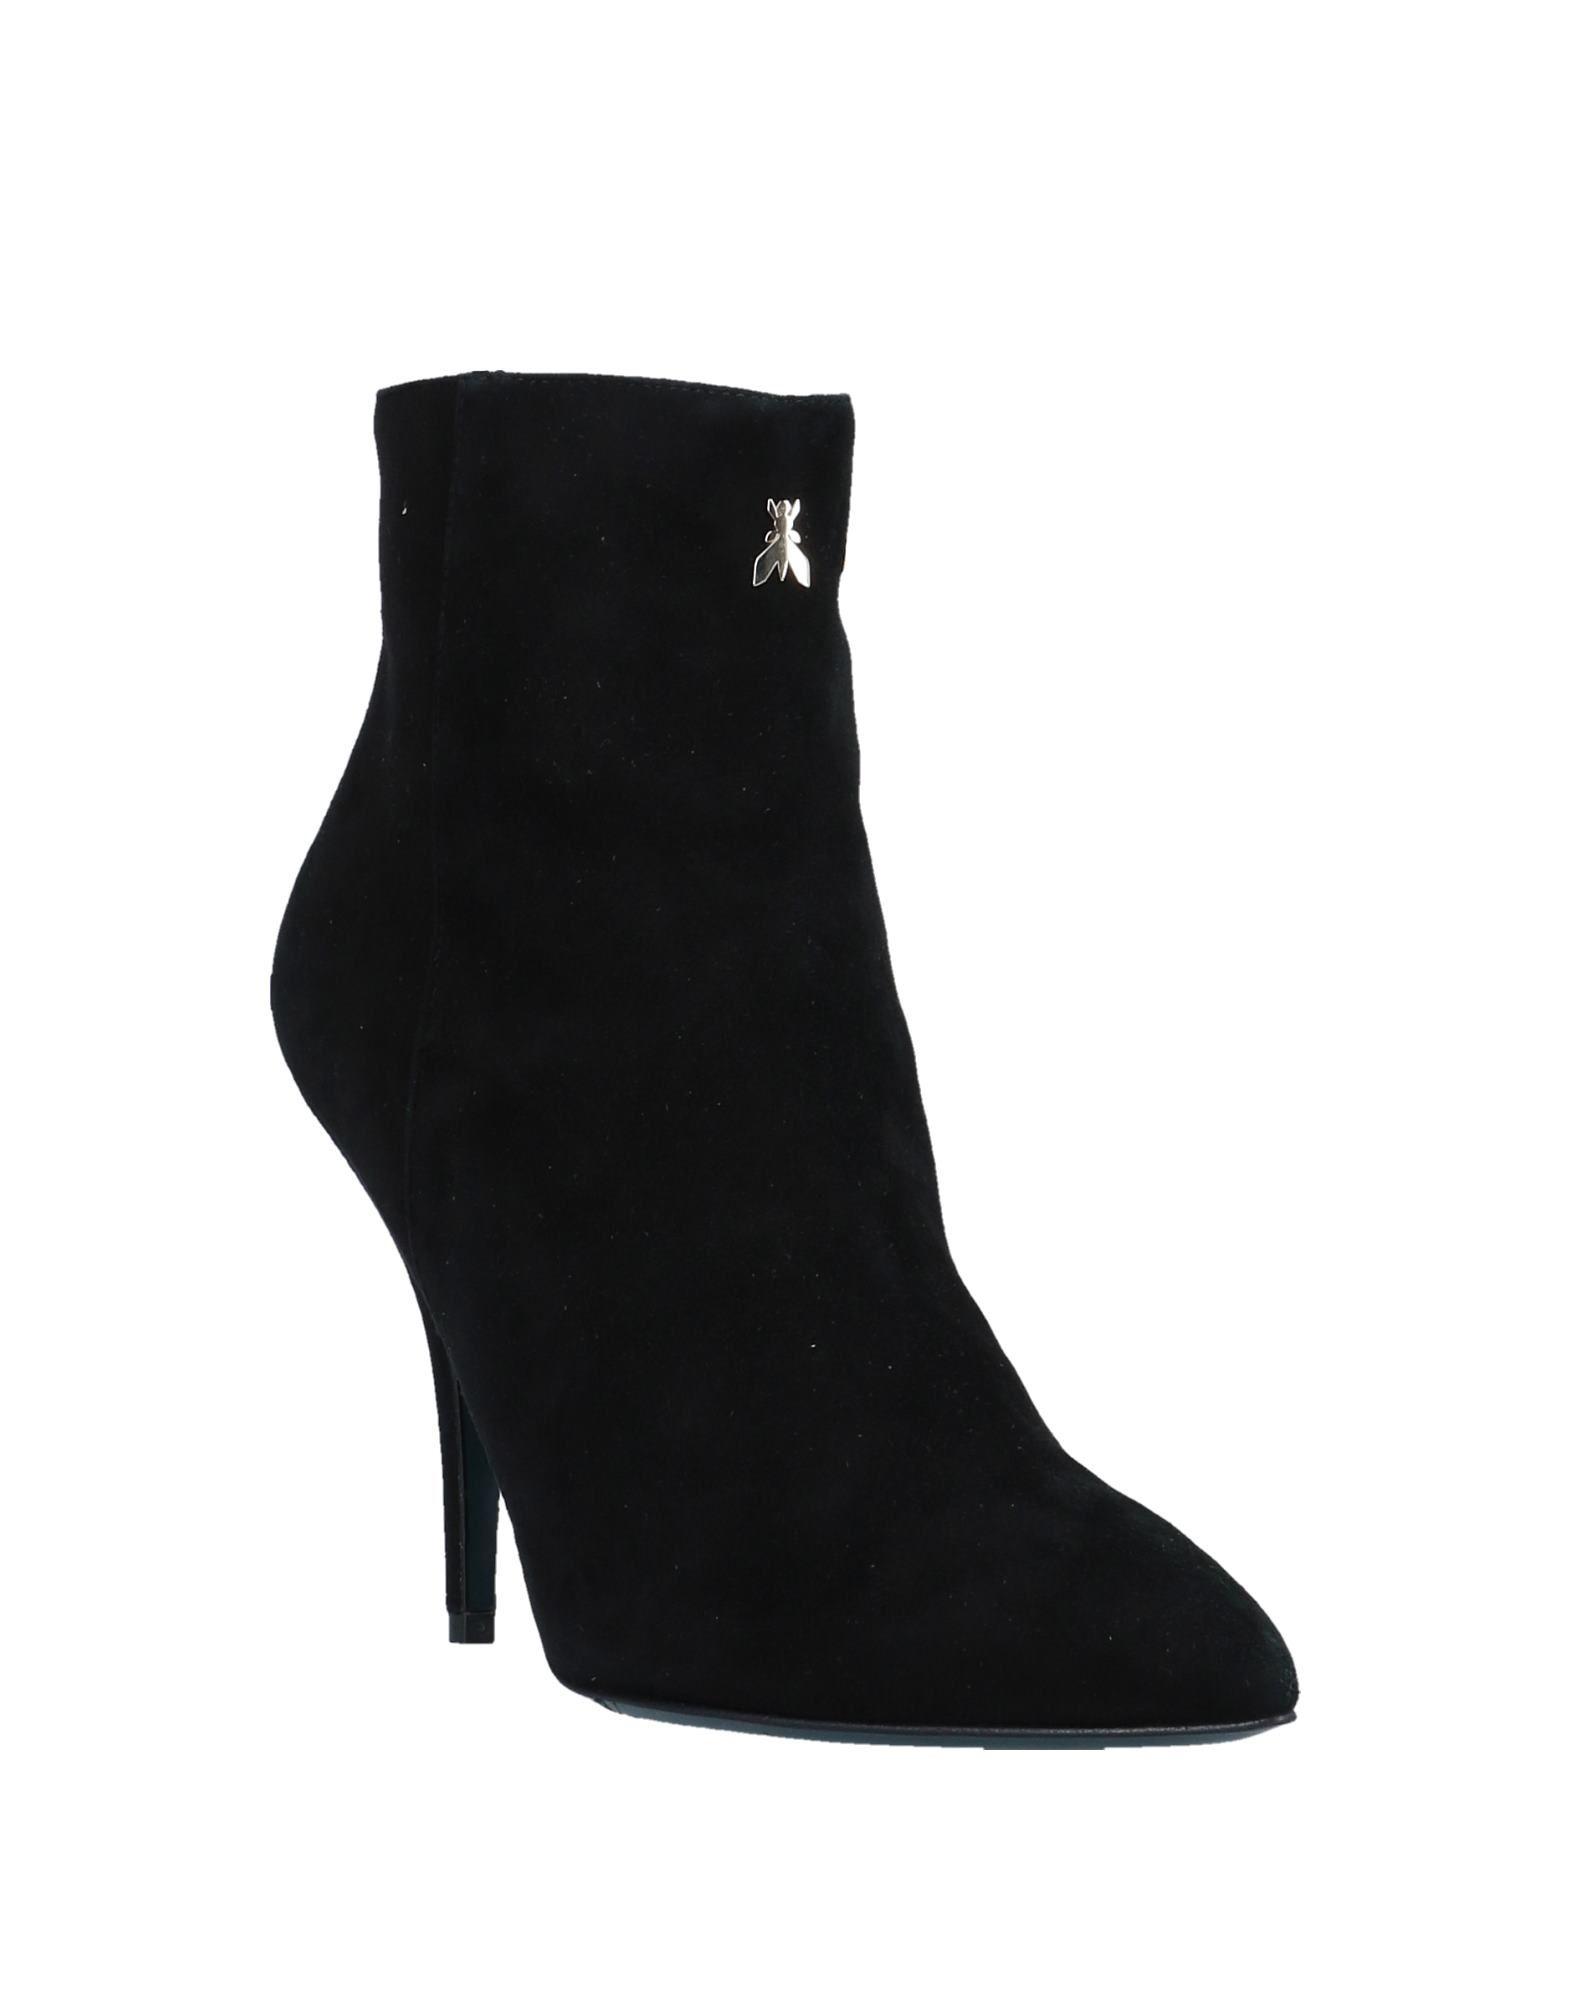 Patrizia Pepe Stiefelette strapazierfähige Damen  11548302TUGut aussehende strapazierfähige Stiefelette Schuhe ad865a